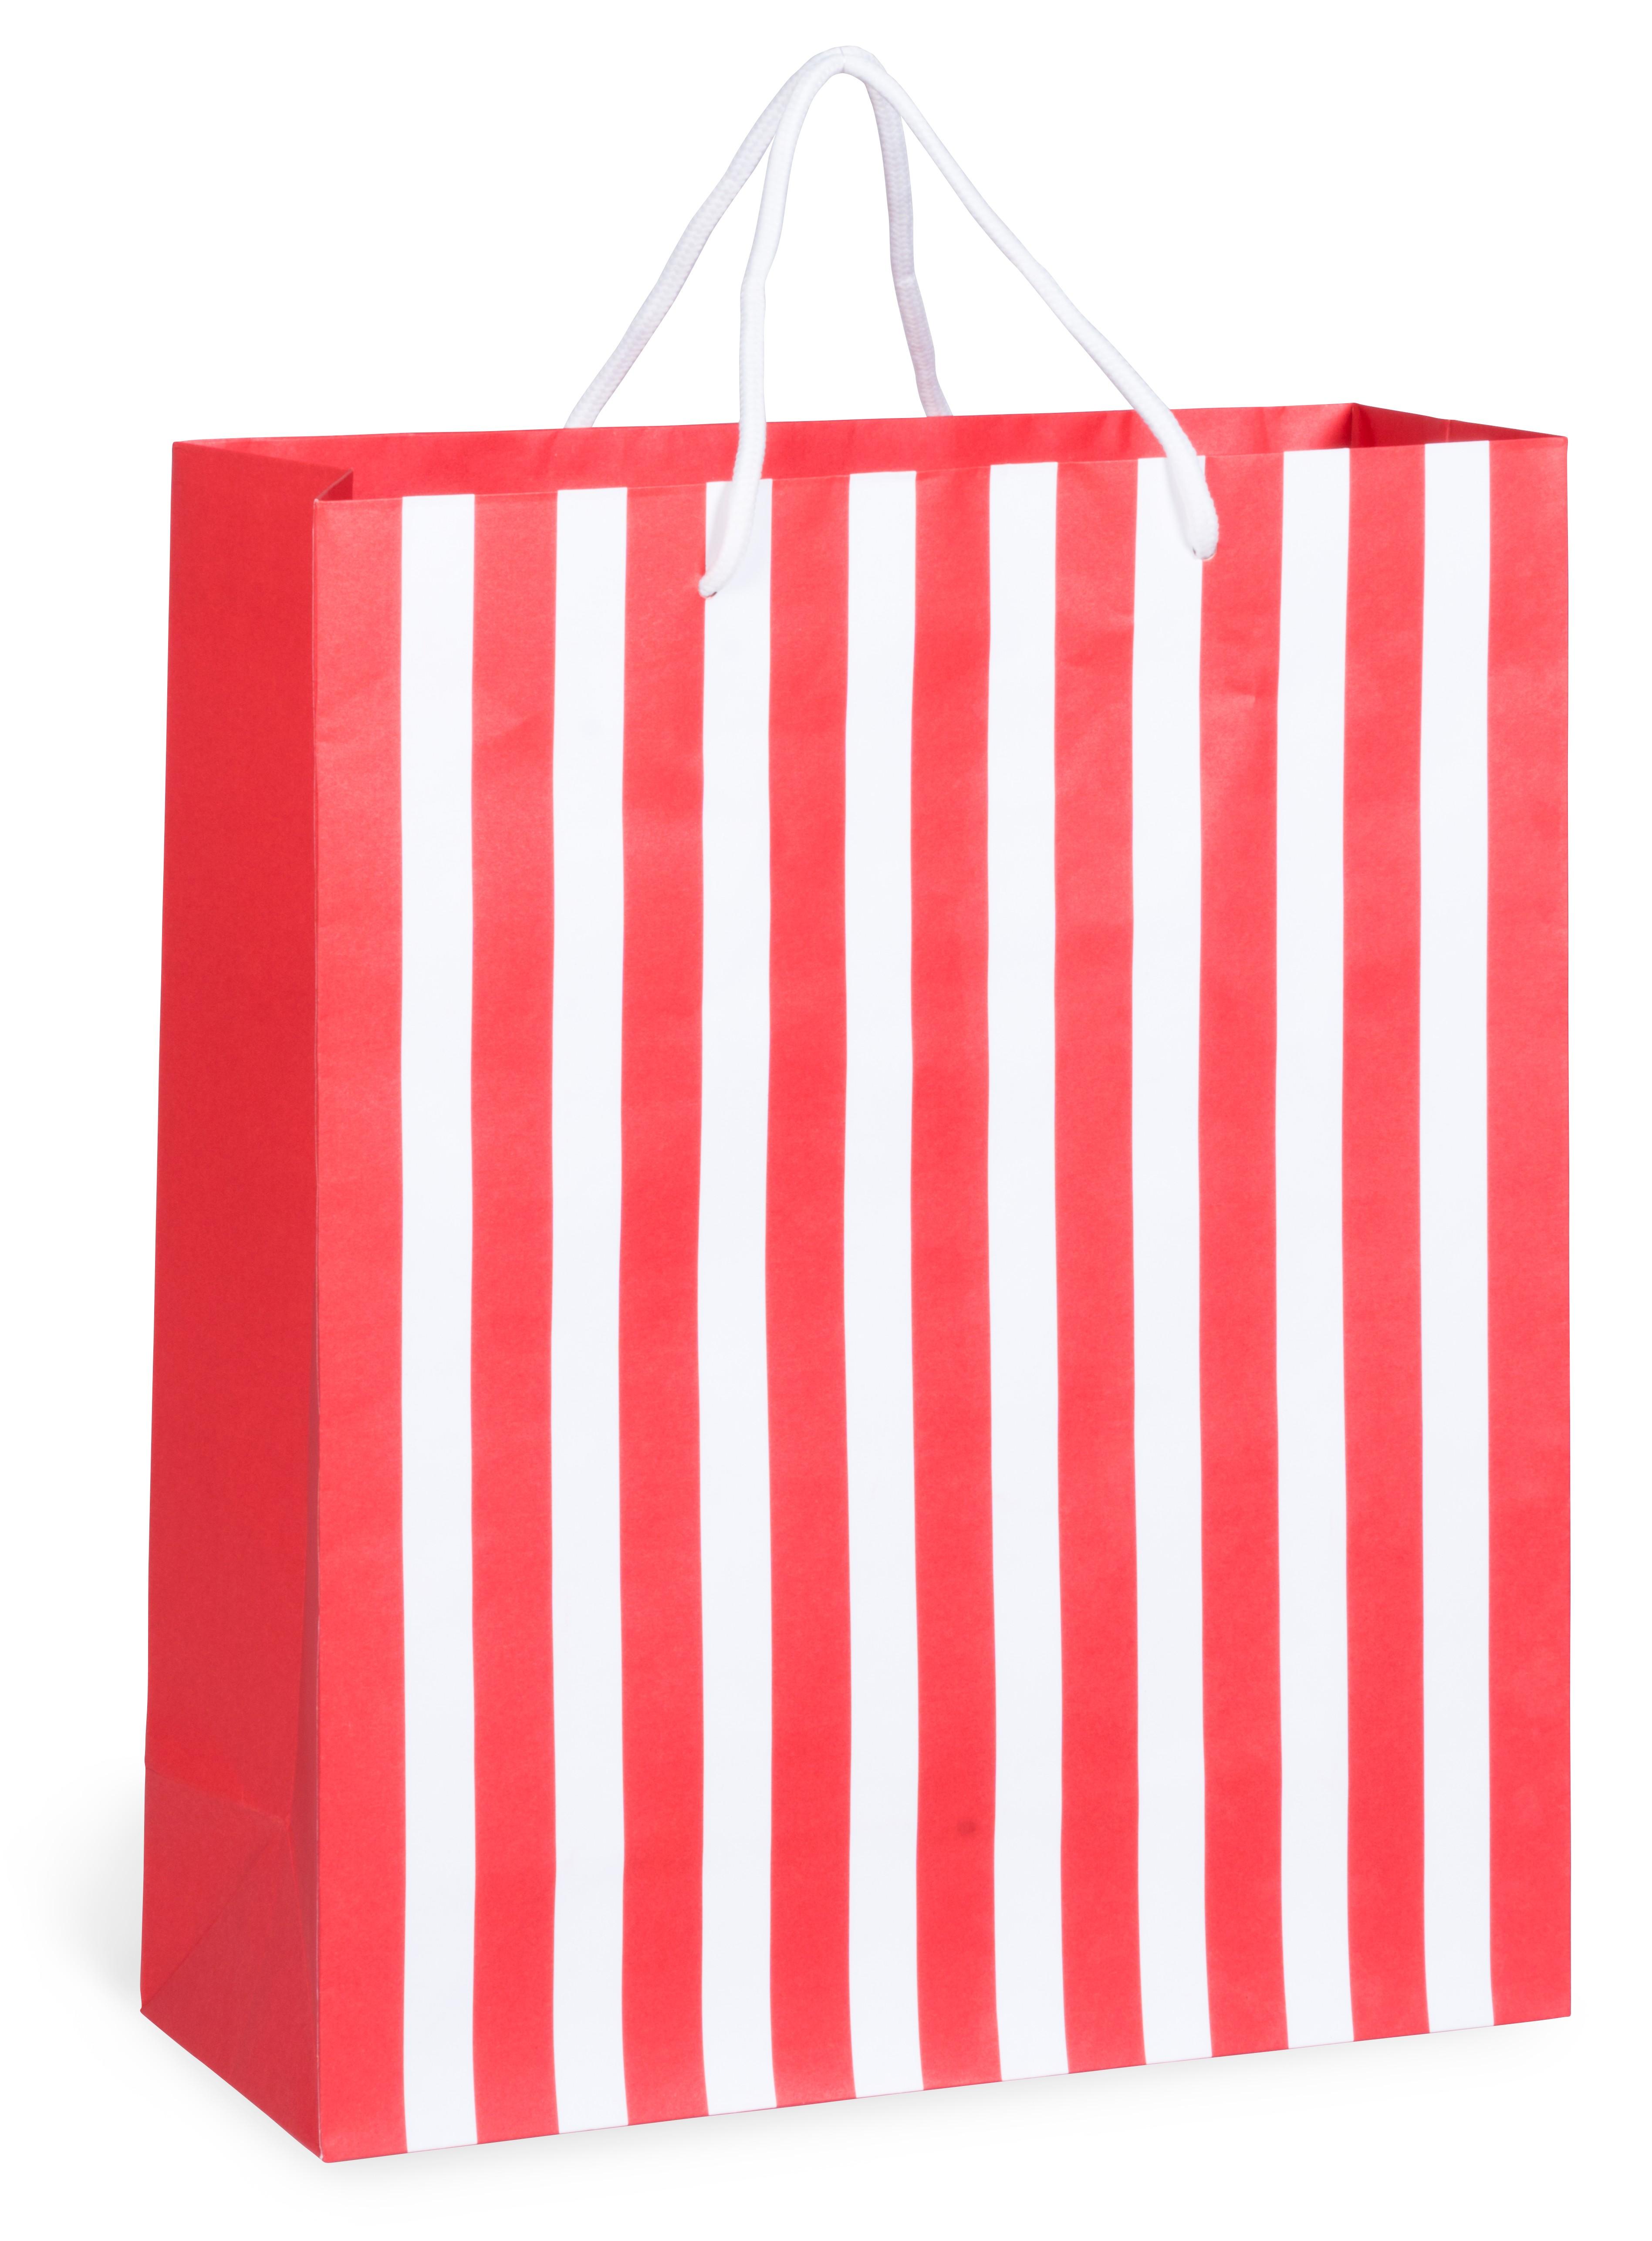 Candy Cane Maxi Gift Bag